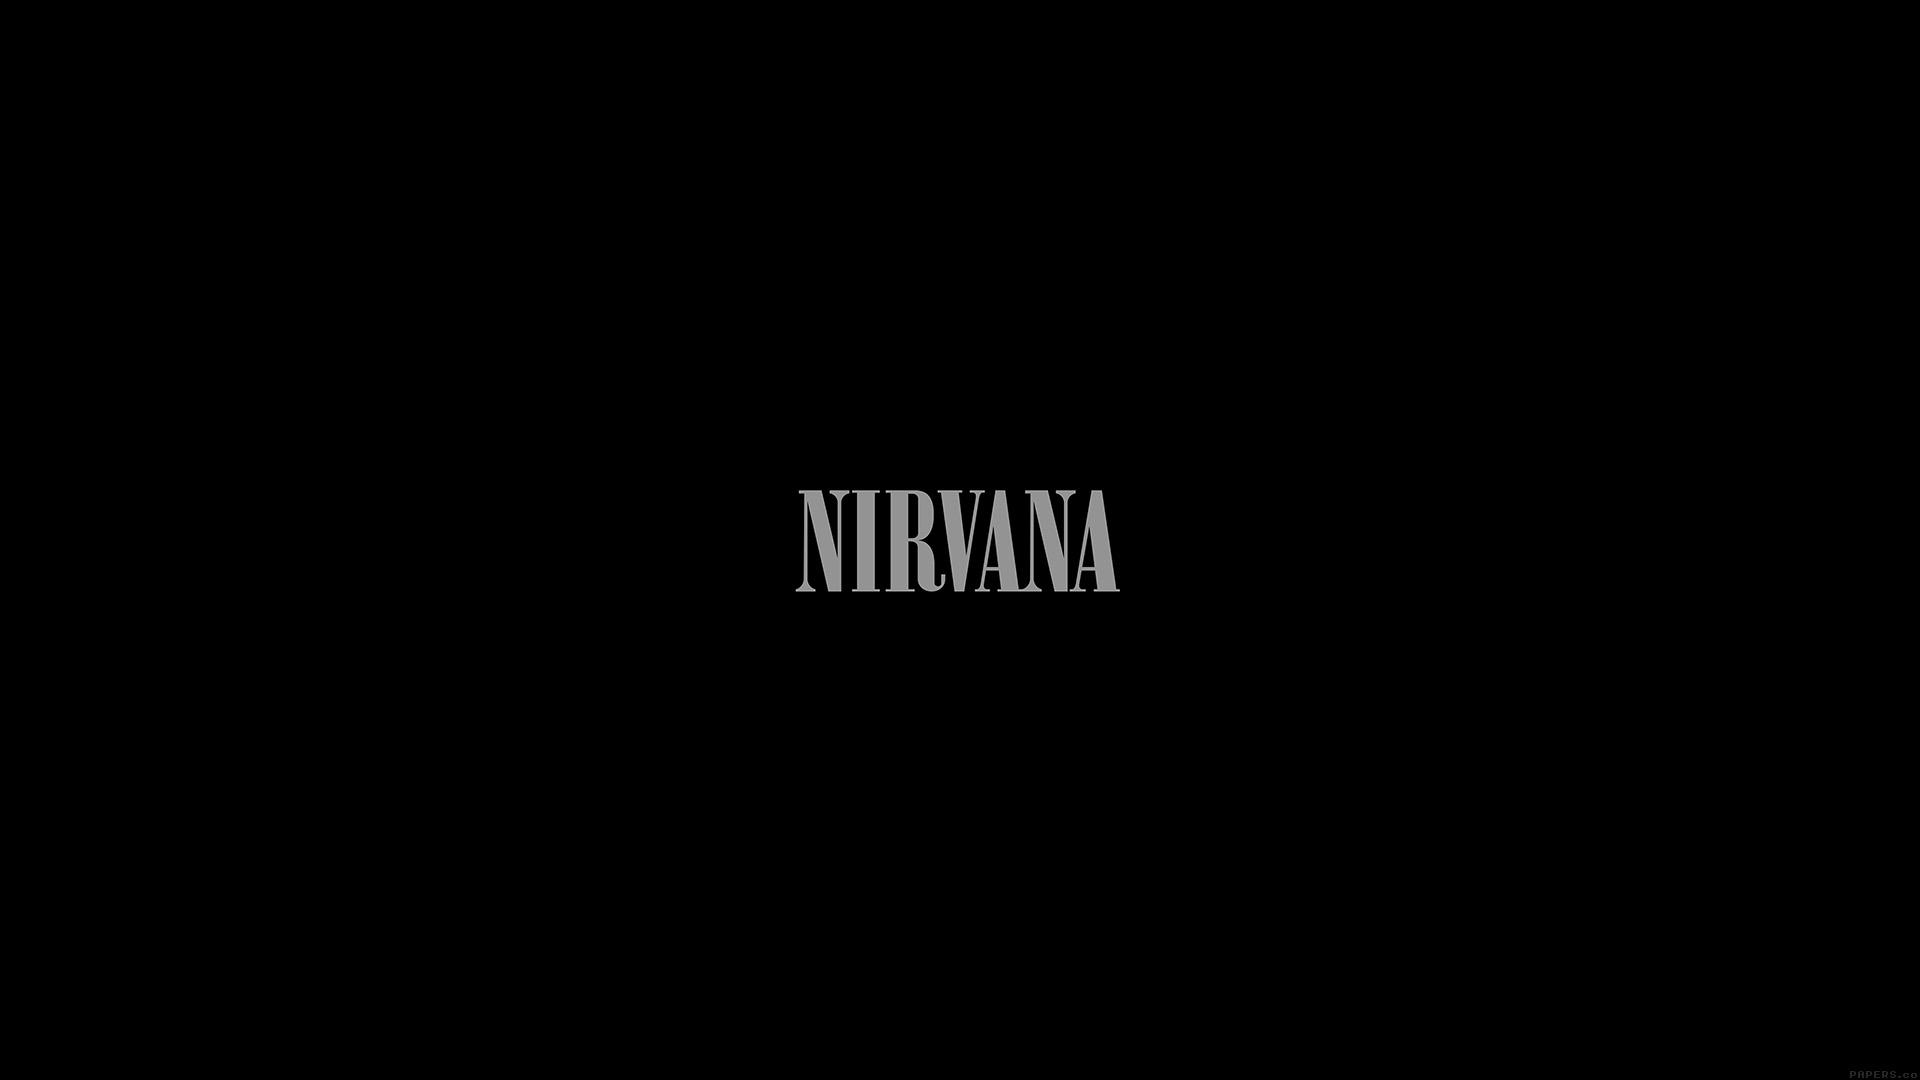 Hd Christmas Wallpapers 1080p Ak78 Nirvana Dark Logo Simple Minimal Music Wallpaper